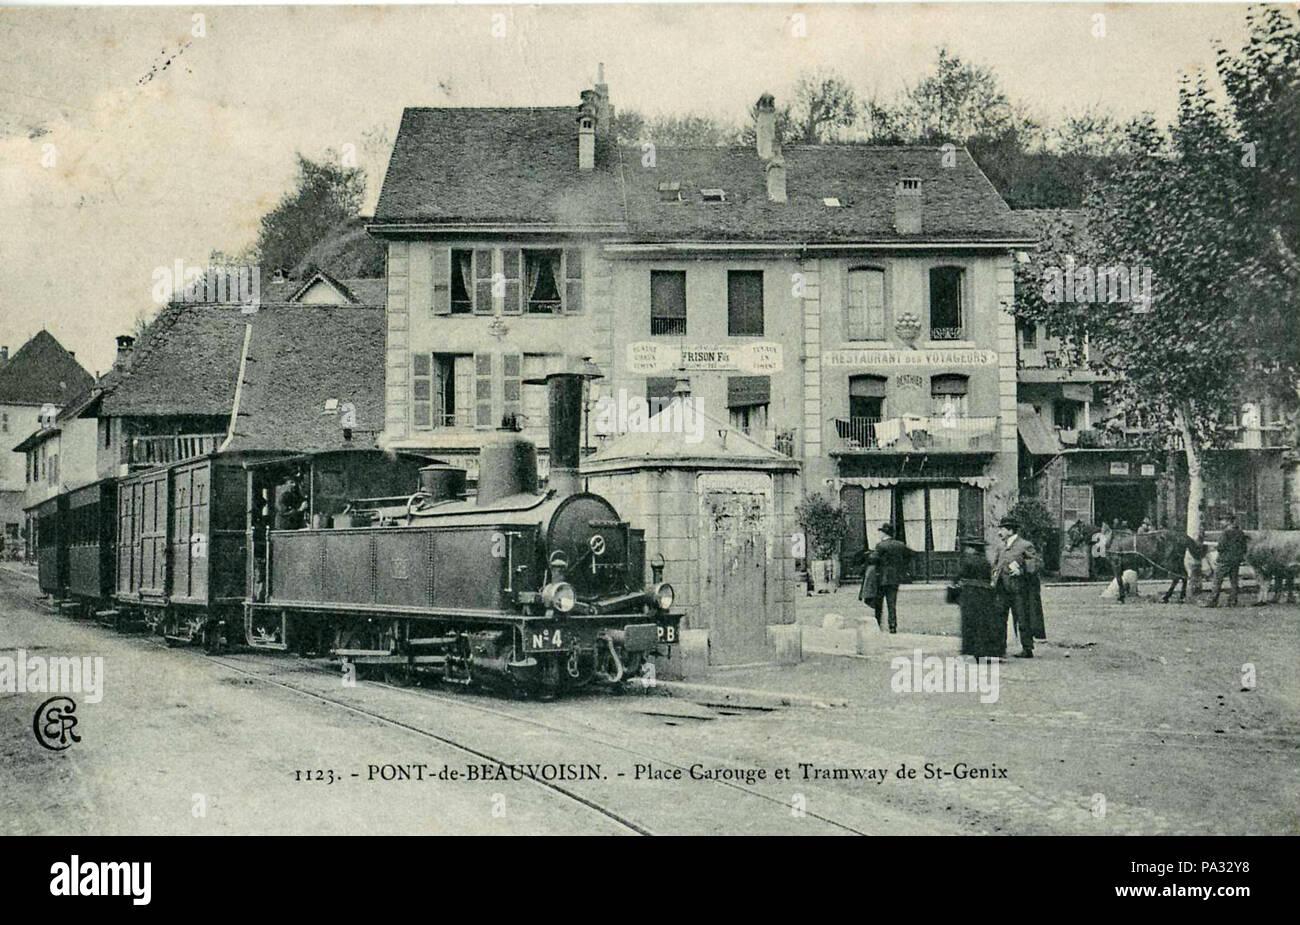 624 ER 1123 - Pont-de-Beauvoisin - Lugar de St-Genix Carouge et tranvía Foto de stock